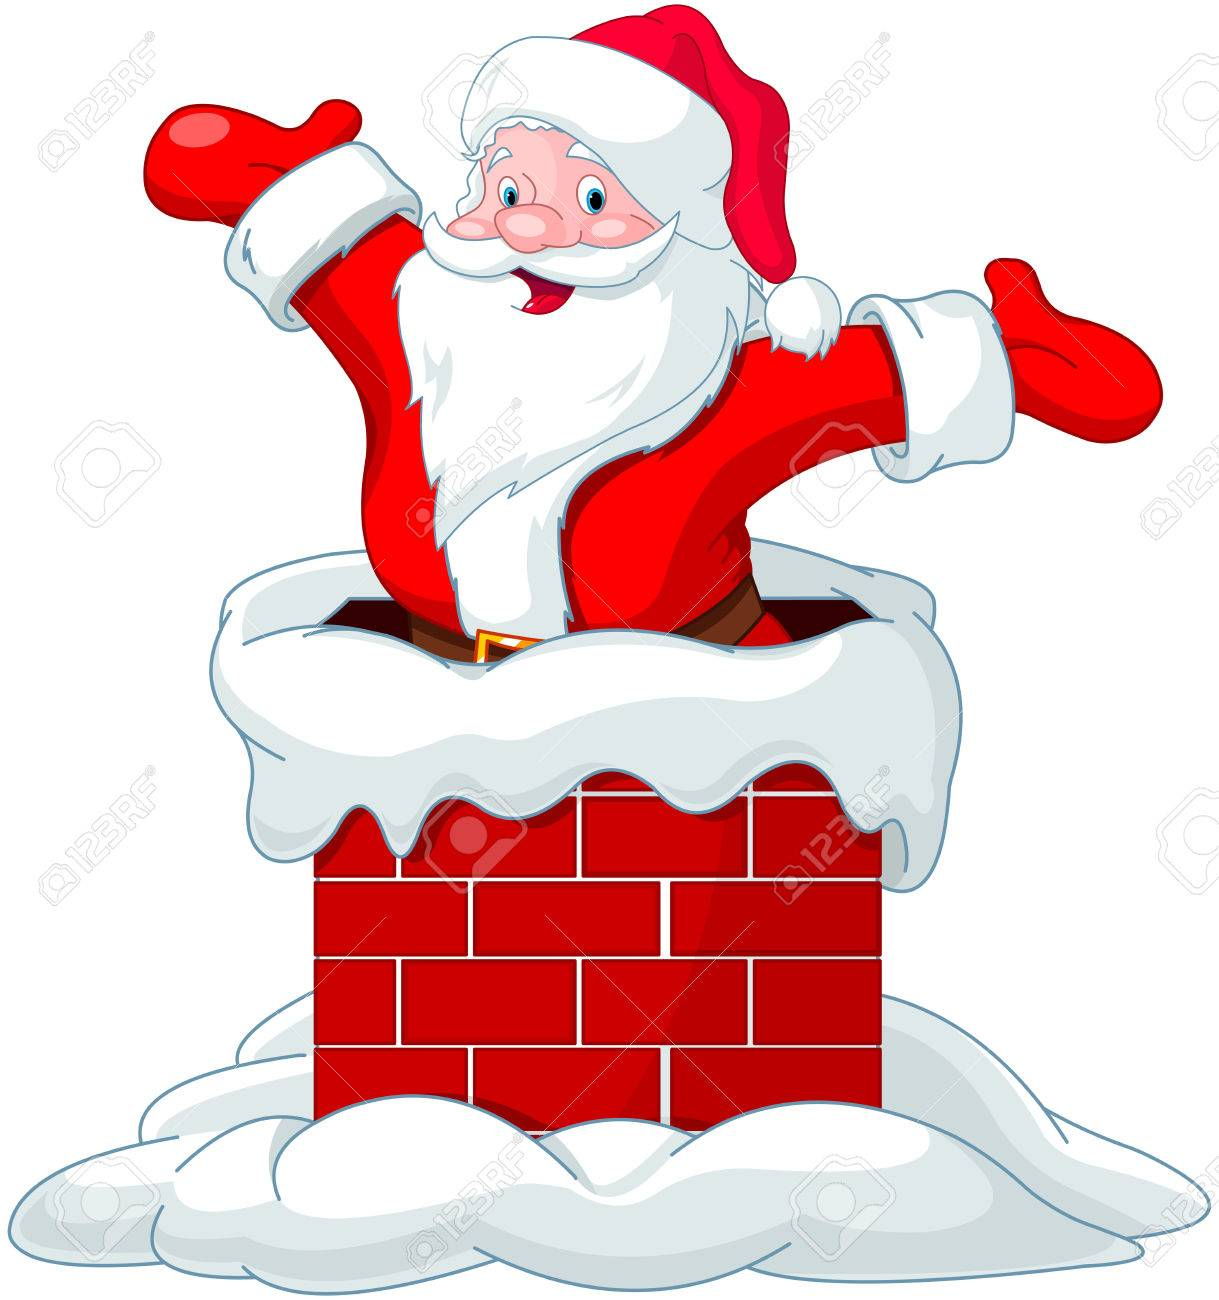 Happy Santa Claus jumping from chimney - 34436399